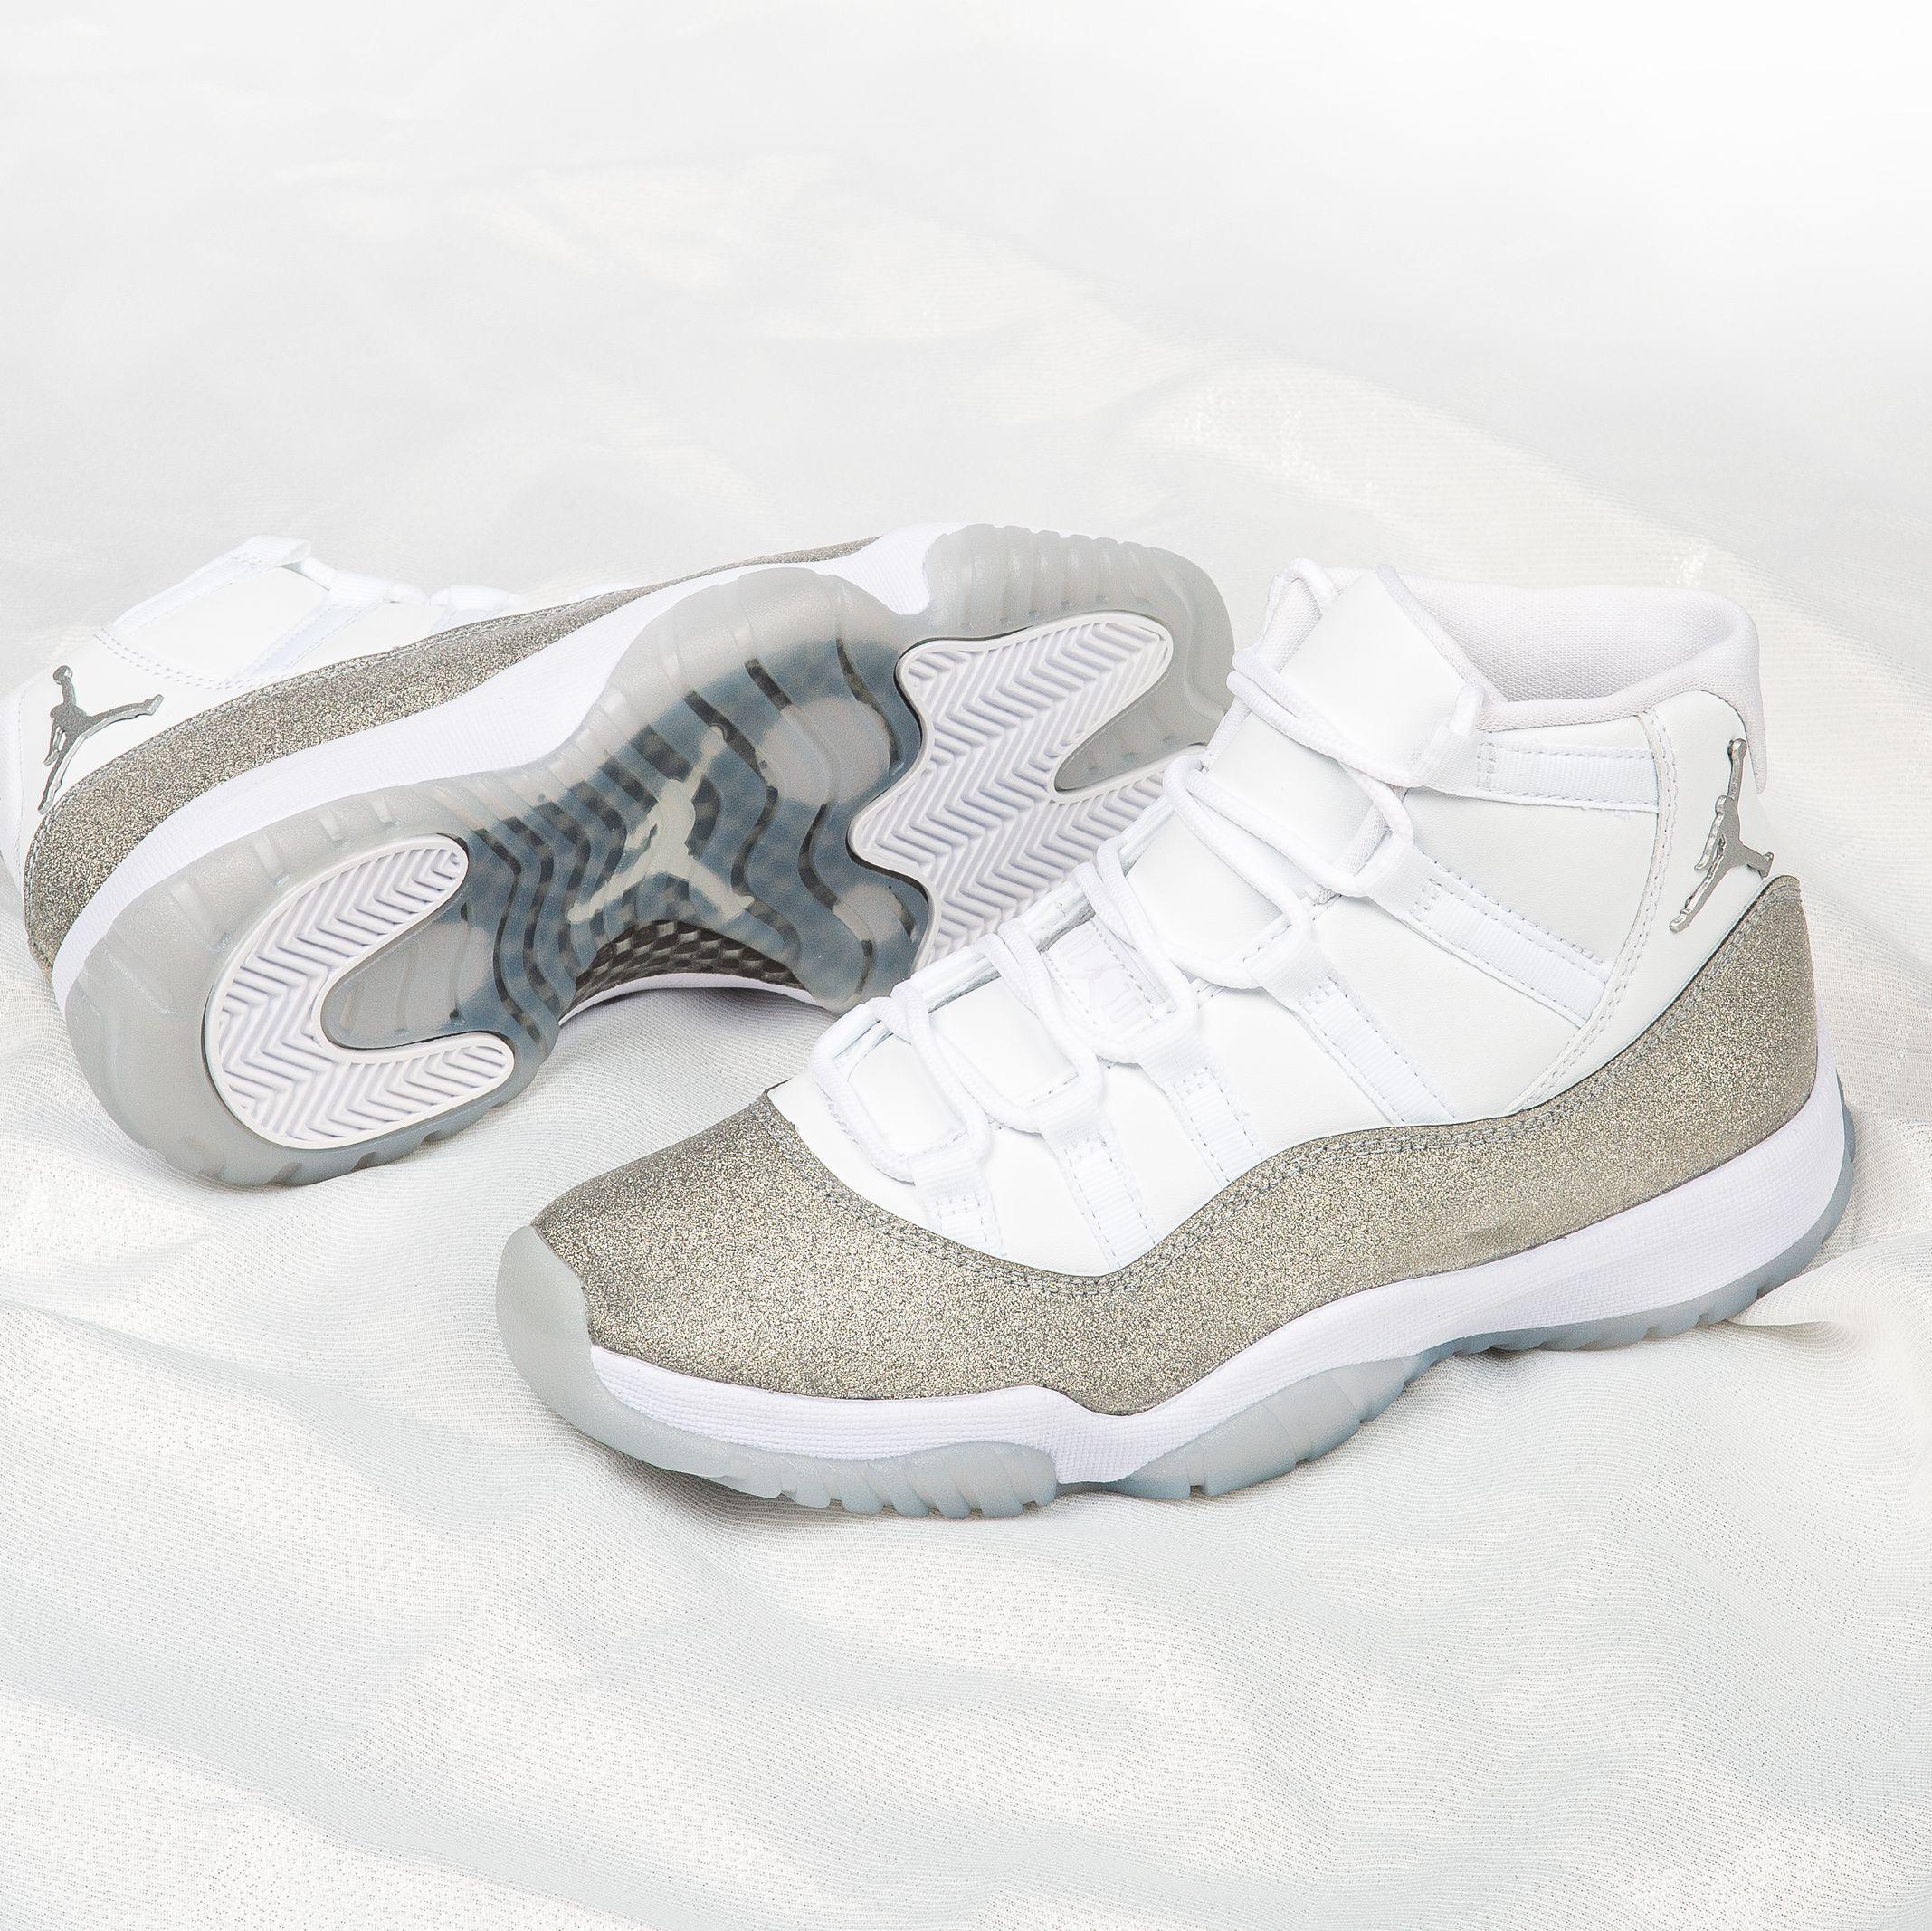 Jordan Retro 11 'Metallic Silver' | Retro 11, Sports women ...